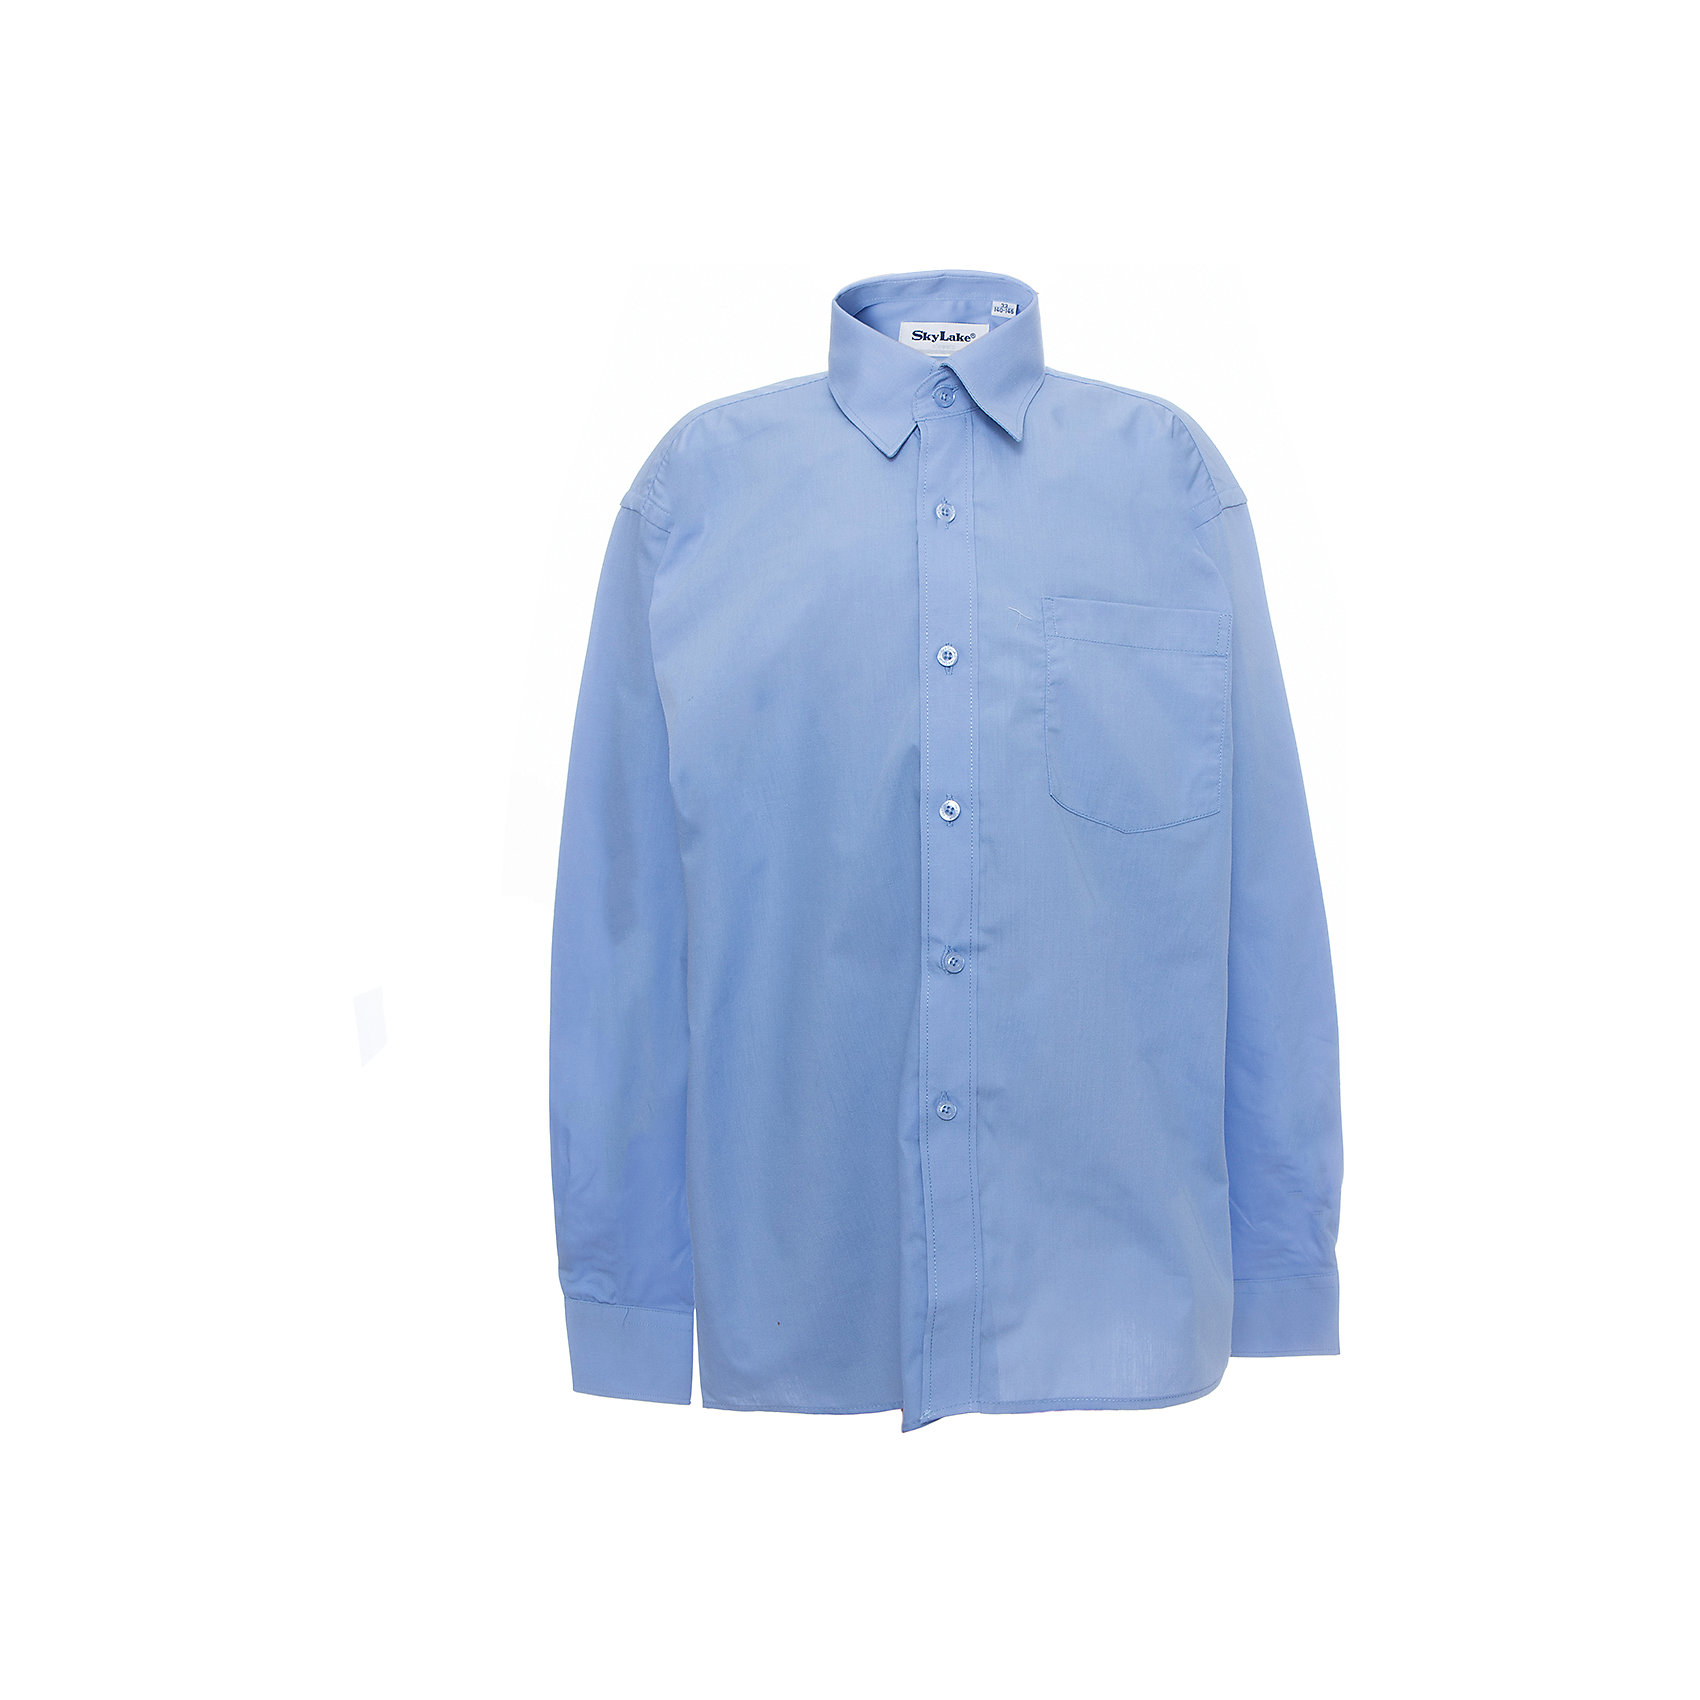 Рубашка для мальчика SkylakeБлузки и рубашки<br>Рубашка для мальчика от известного бренда Skylake<br><br>Состав:<br>80% хлопок, 20% п/э<br><br>Ширина мм: 174<br>Глубина мм: 10<br>Высота мм: 169<br>Вес г: 157<br>Цвет: синий<br>Возраст от месяцев: 132<br>Возраст до месяцев: 144<br>Пол: Мужской<br>Возраст: Детский<br>Размер: 152,122,158,146,140,134,128<br>SKU: 4723370